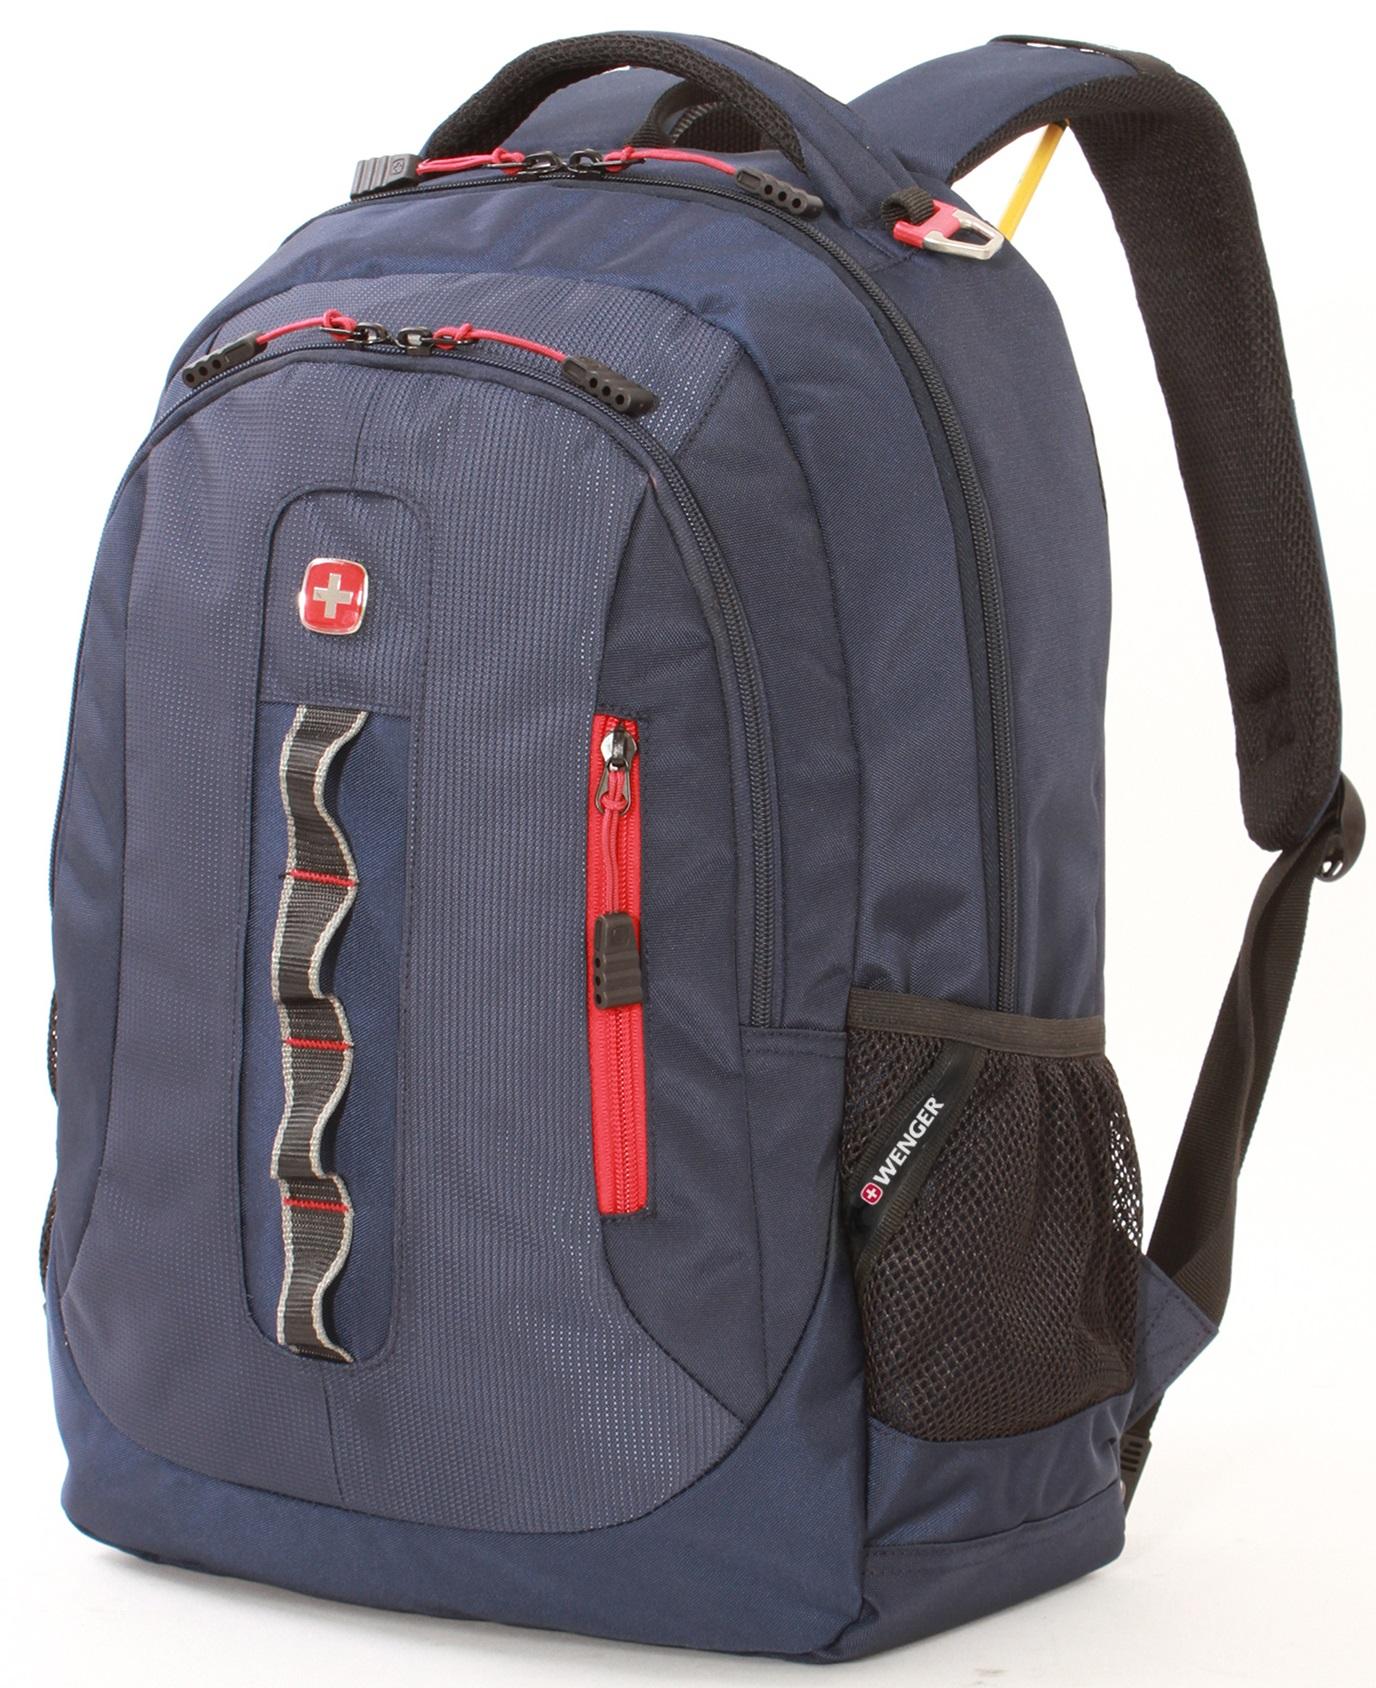 Wenger 6793301408 - рюкзак (Blue) рюкзаки wenger 6793301408